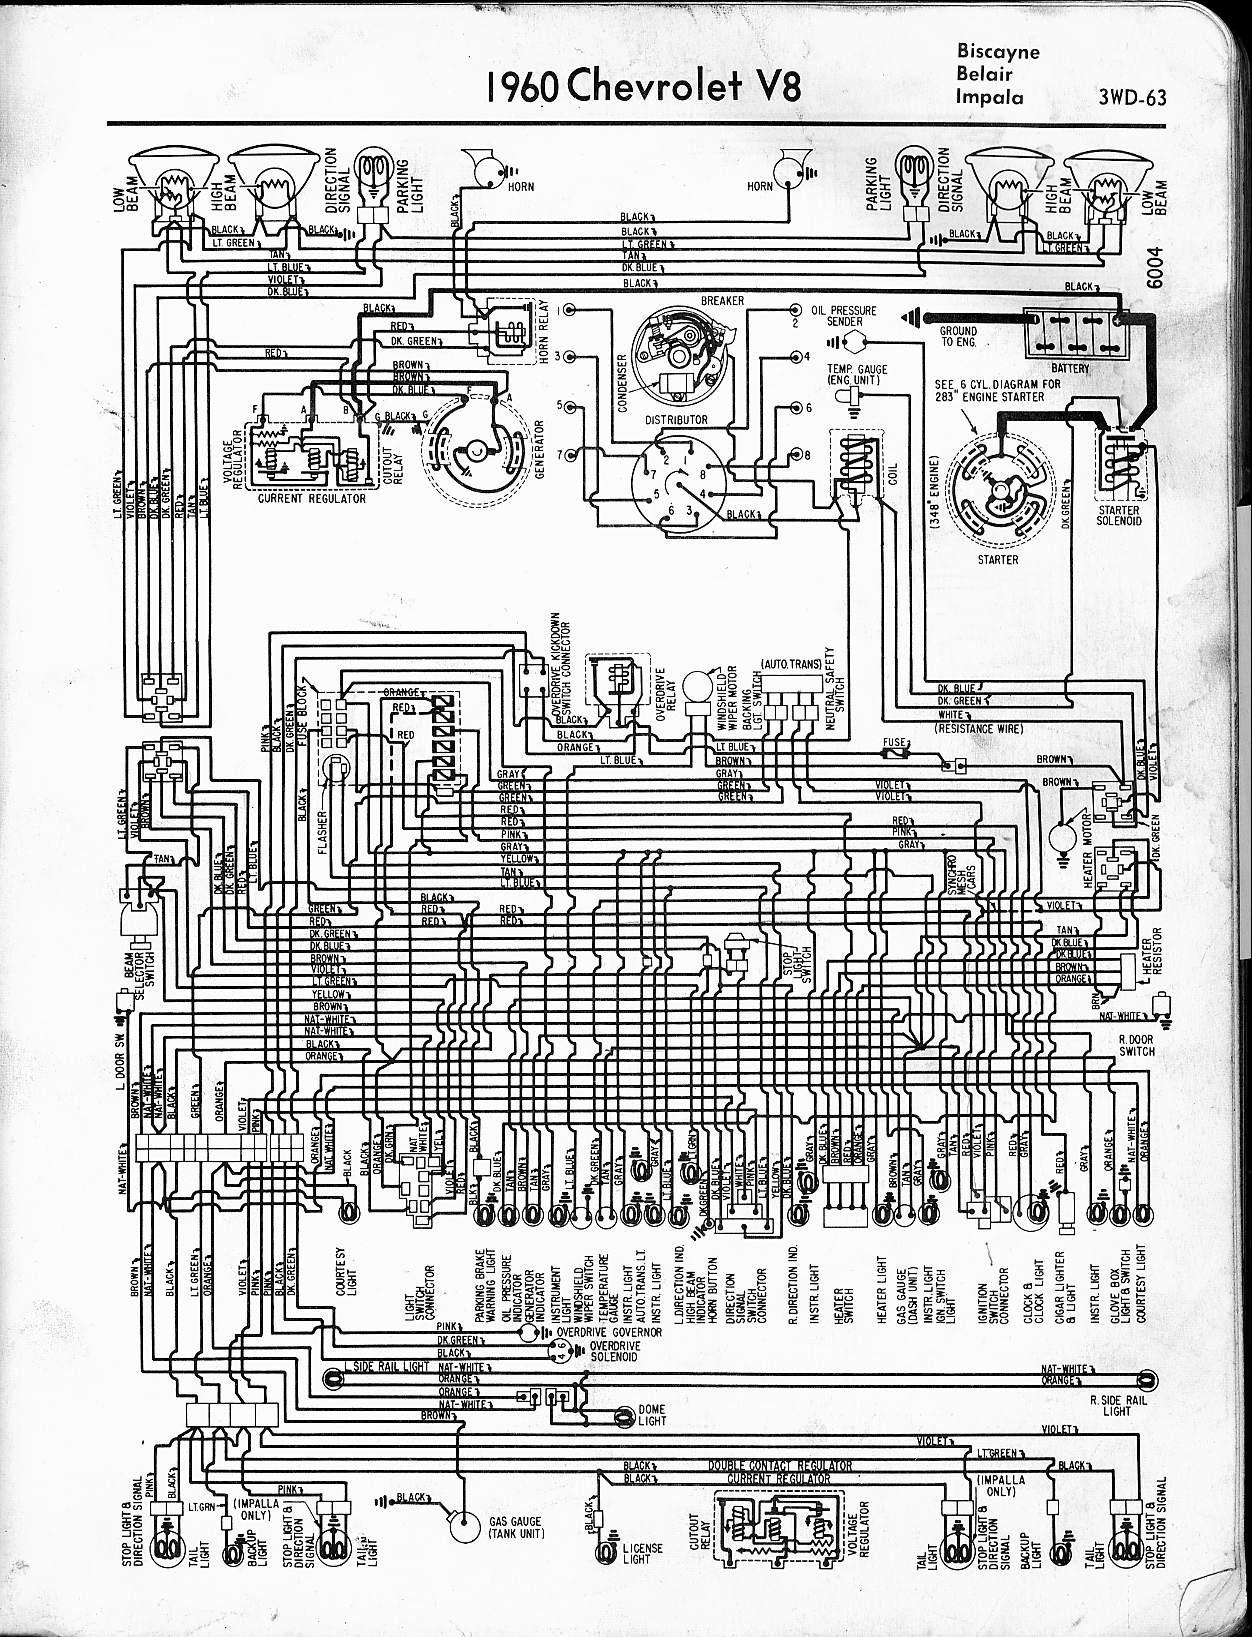 85 Chevy Truck Wiring Diagram 57 65 Chevy Wiring Diagrams Of 85 Chevy Truck Wiring Diagram